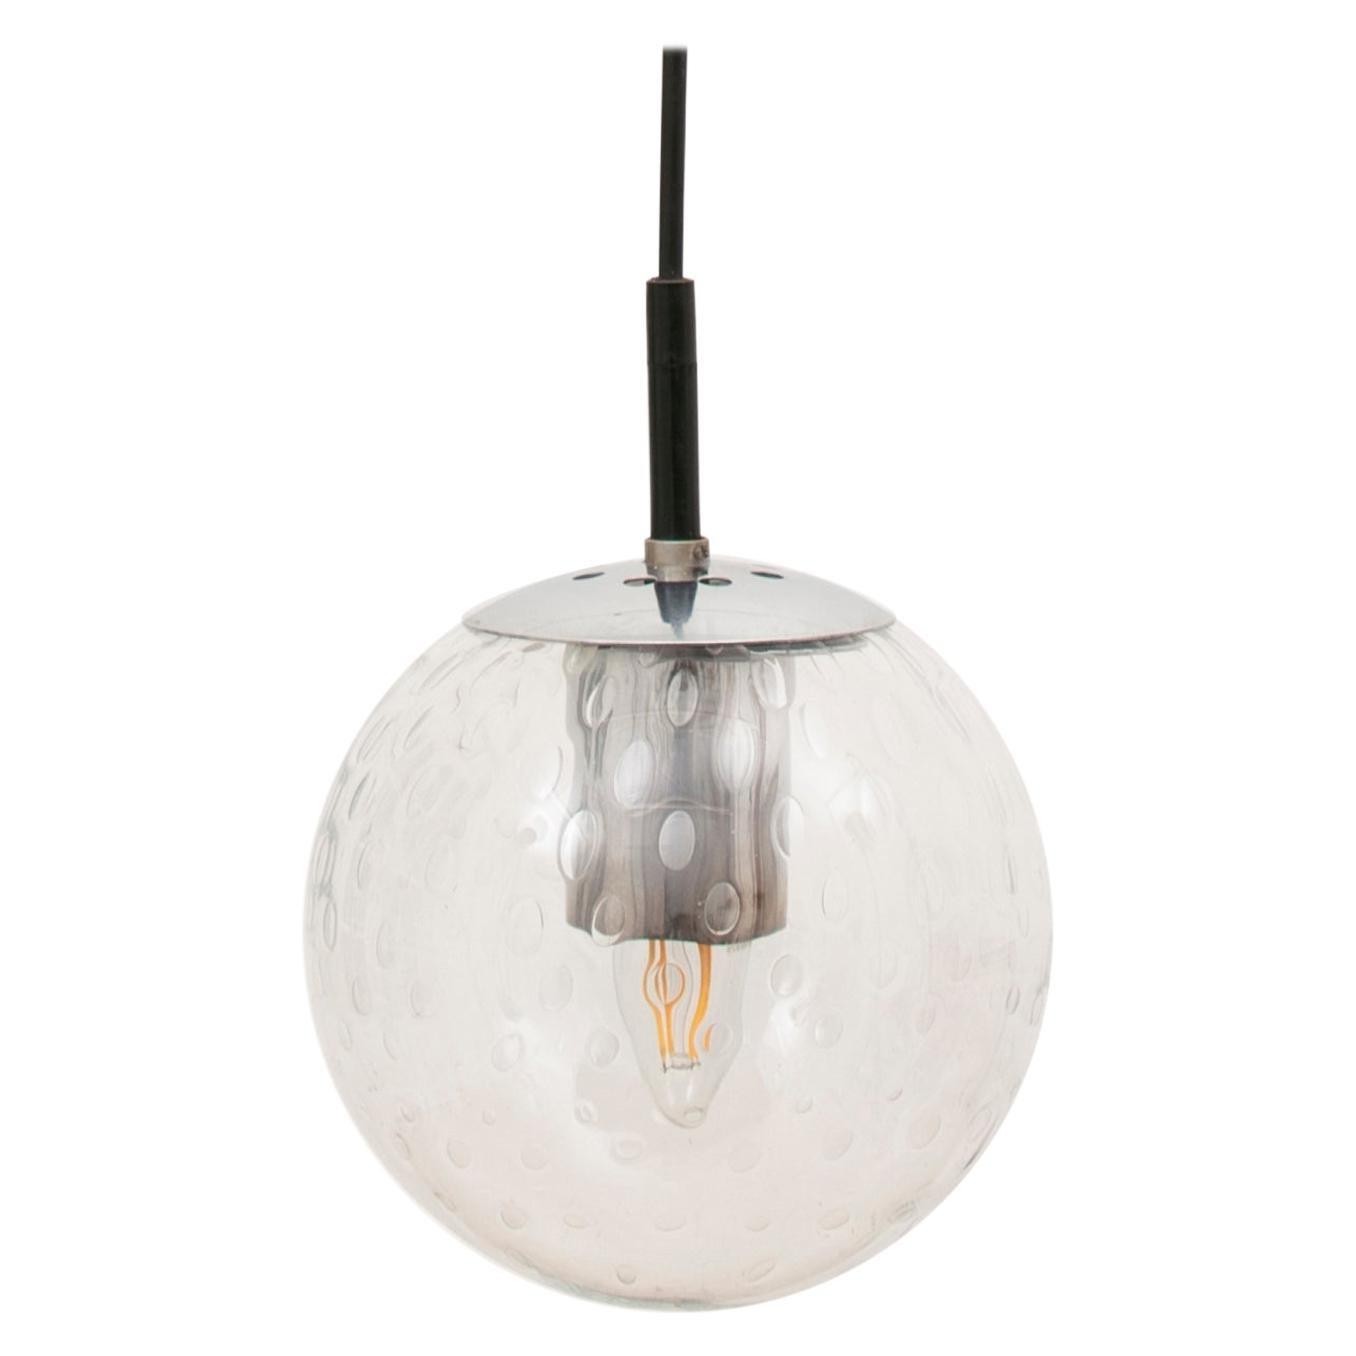 1960s Dutch Globe Pendant 'Light Drops' Light by RAAK Amsterdam 4 Available